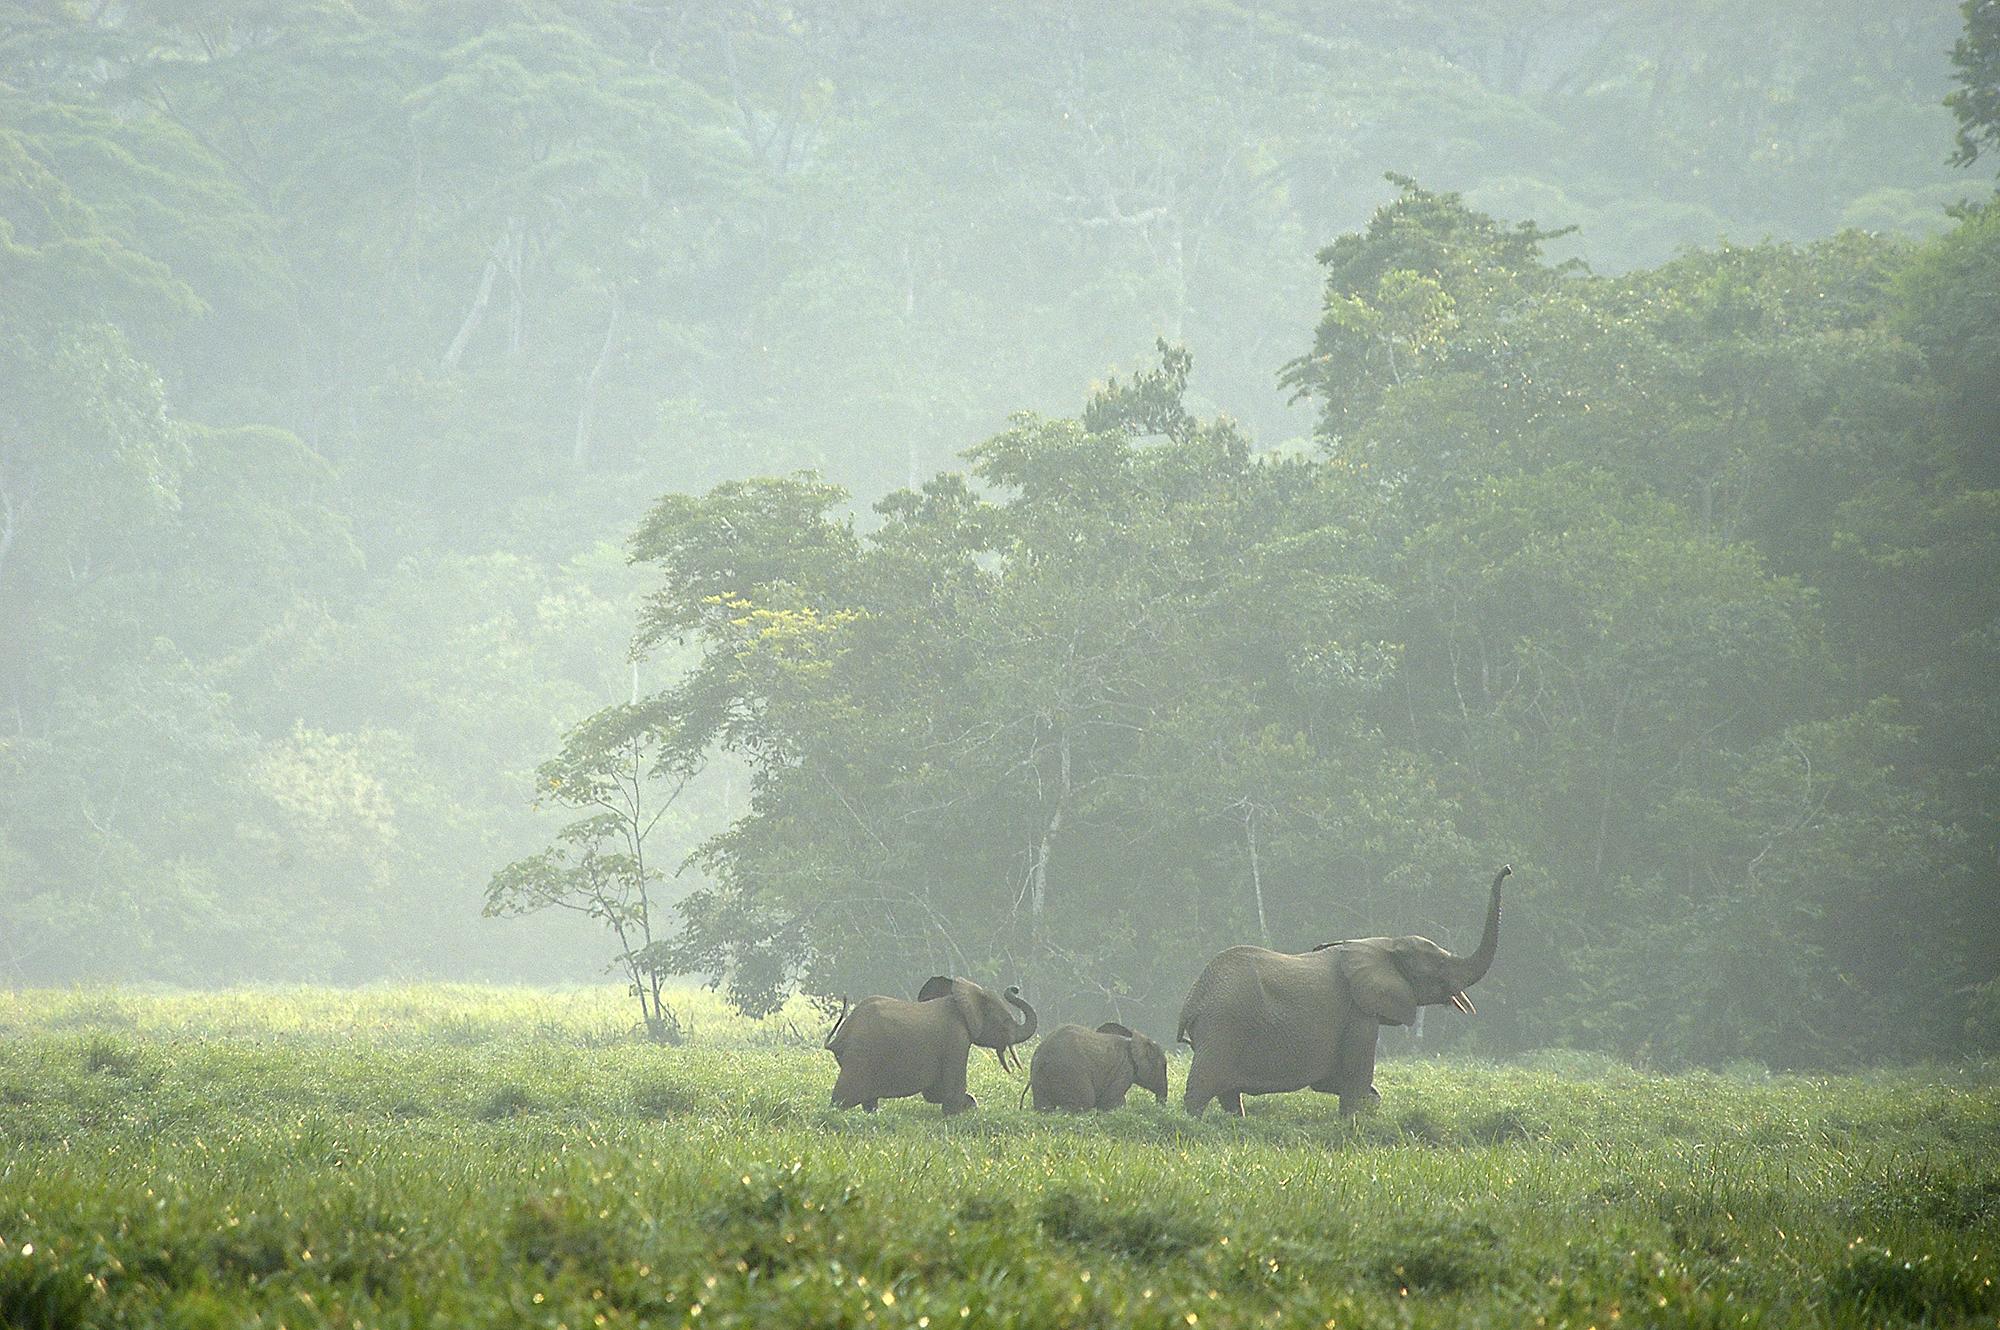 World Elephant Day – Mouadje, Are You Still Alive?